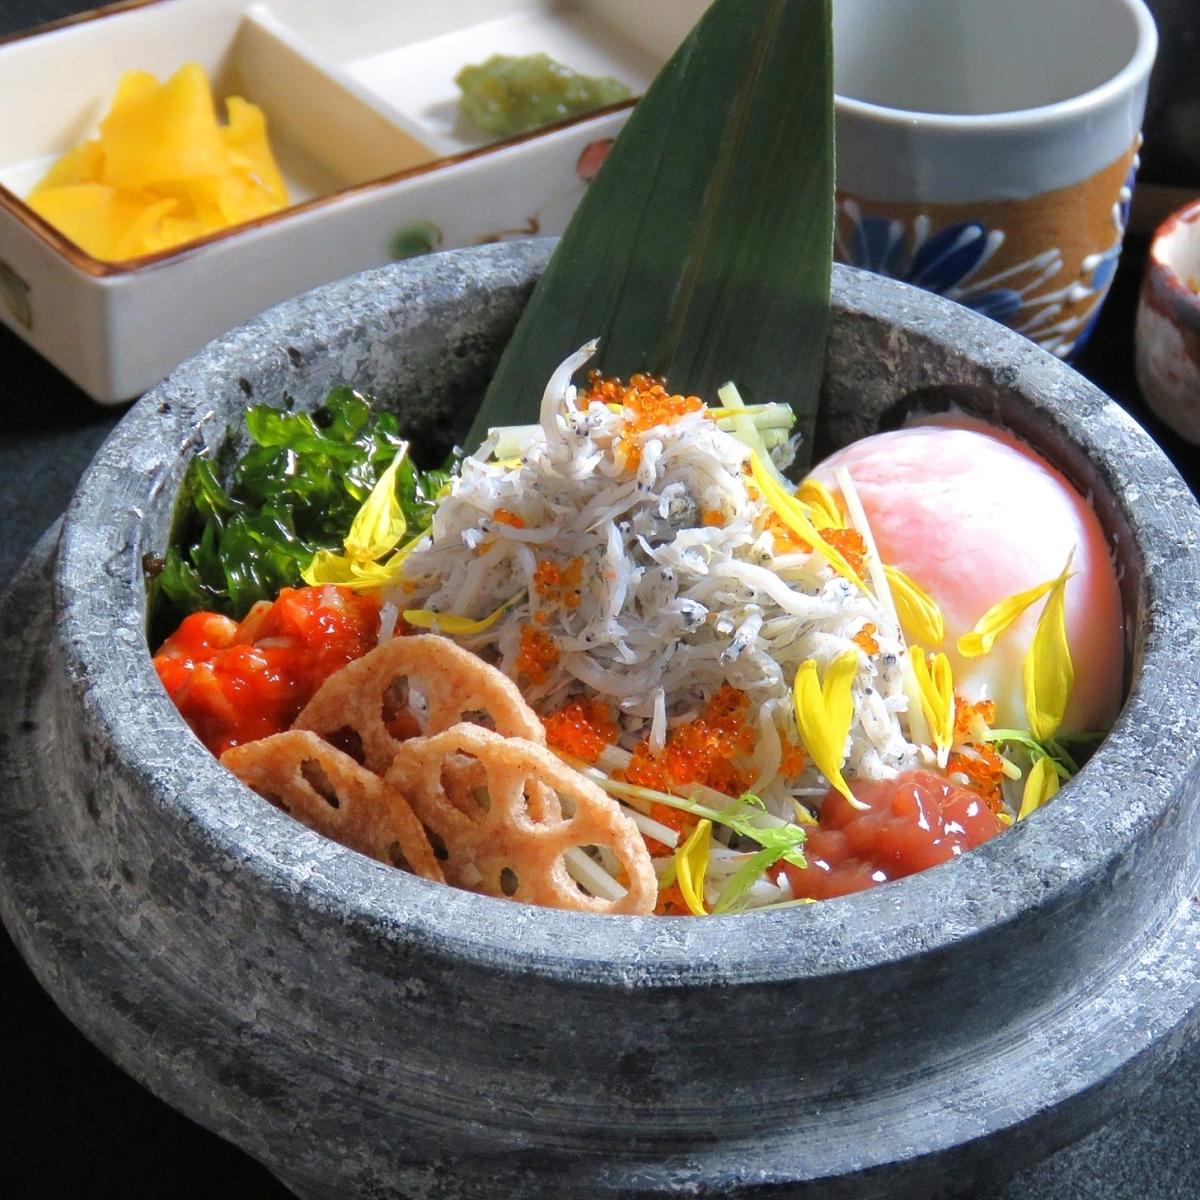 Lots of shrimps and tea pickles of Mitsuba